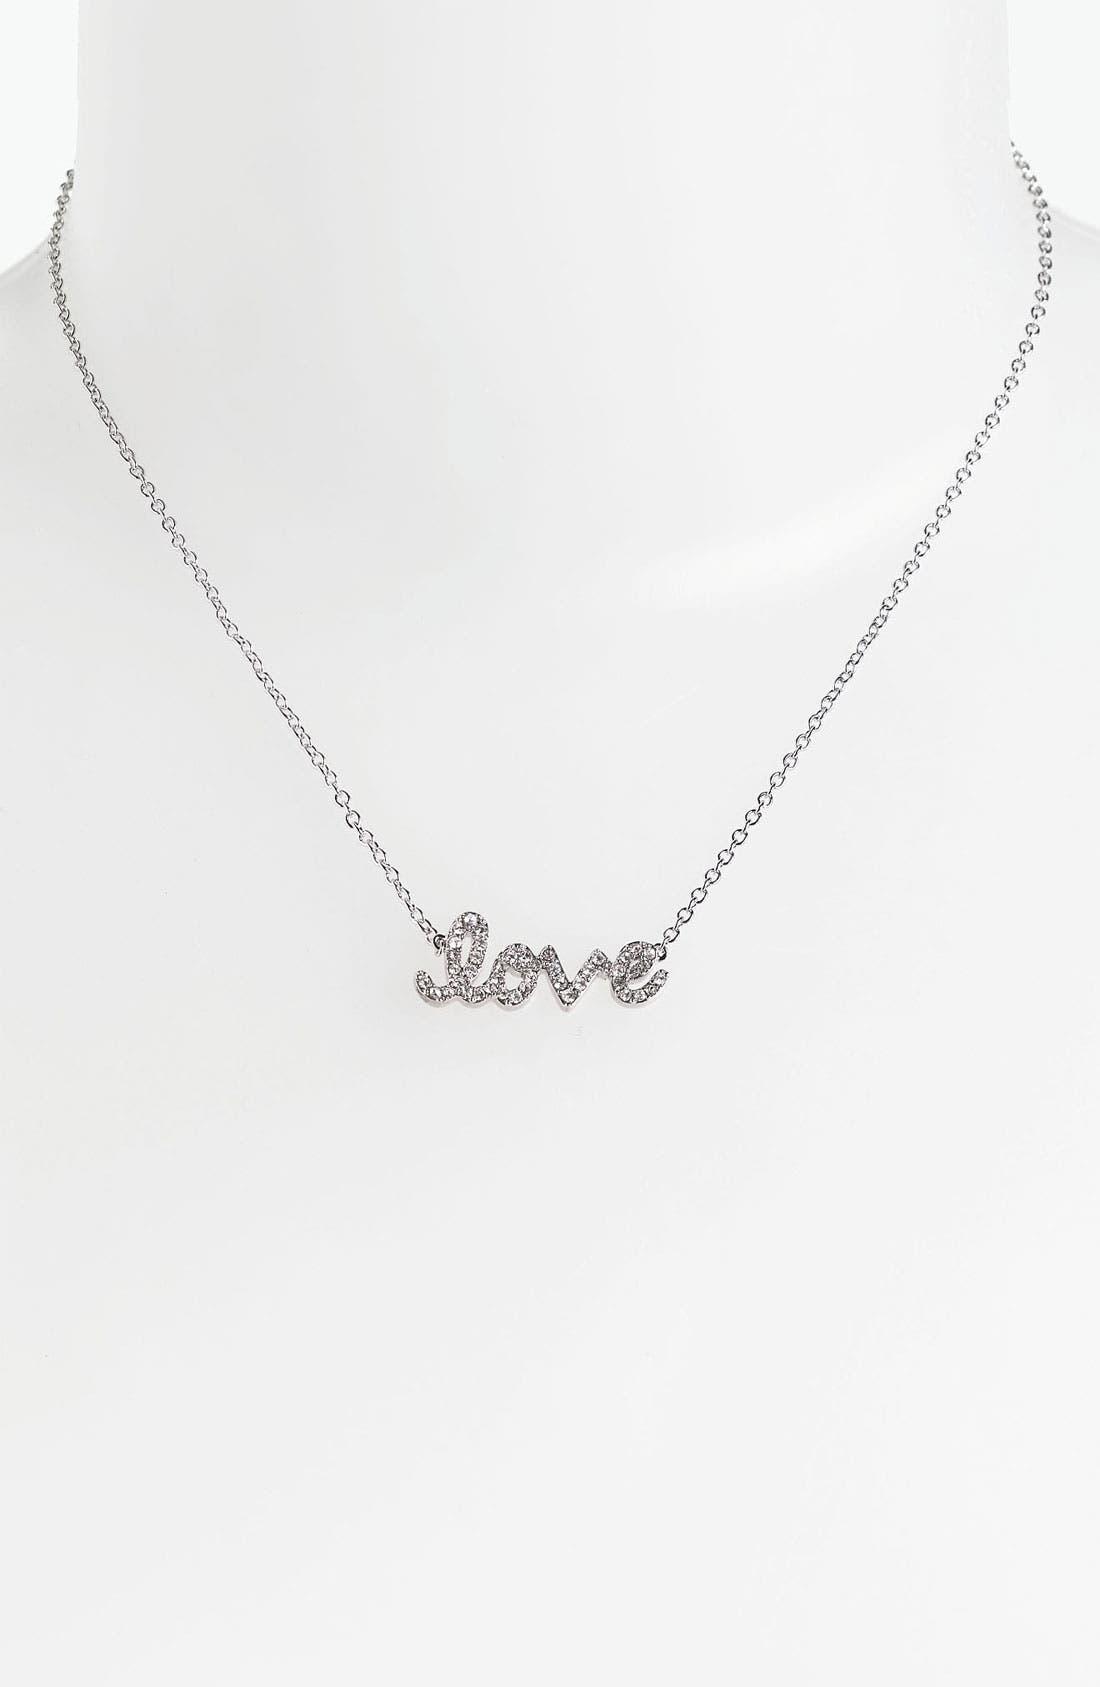 Alternate Image 1 Selected - Ariella Collection 'Messages - Love' Script Pendant Necklace